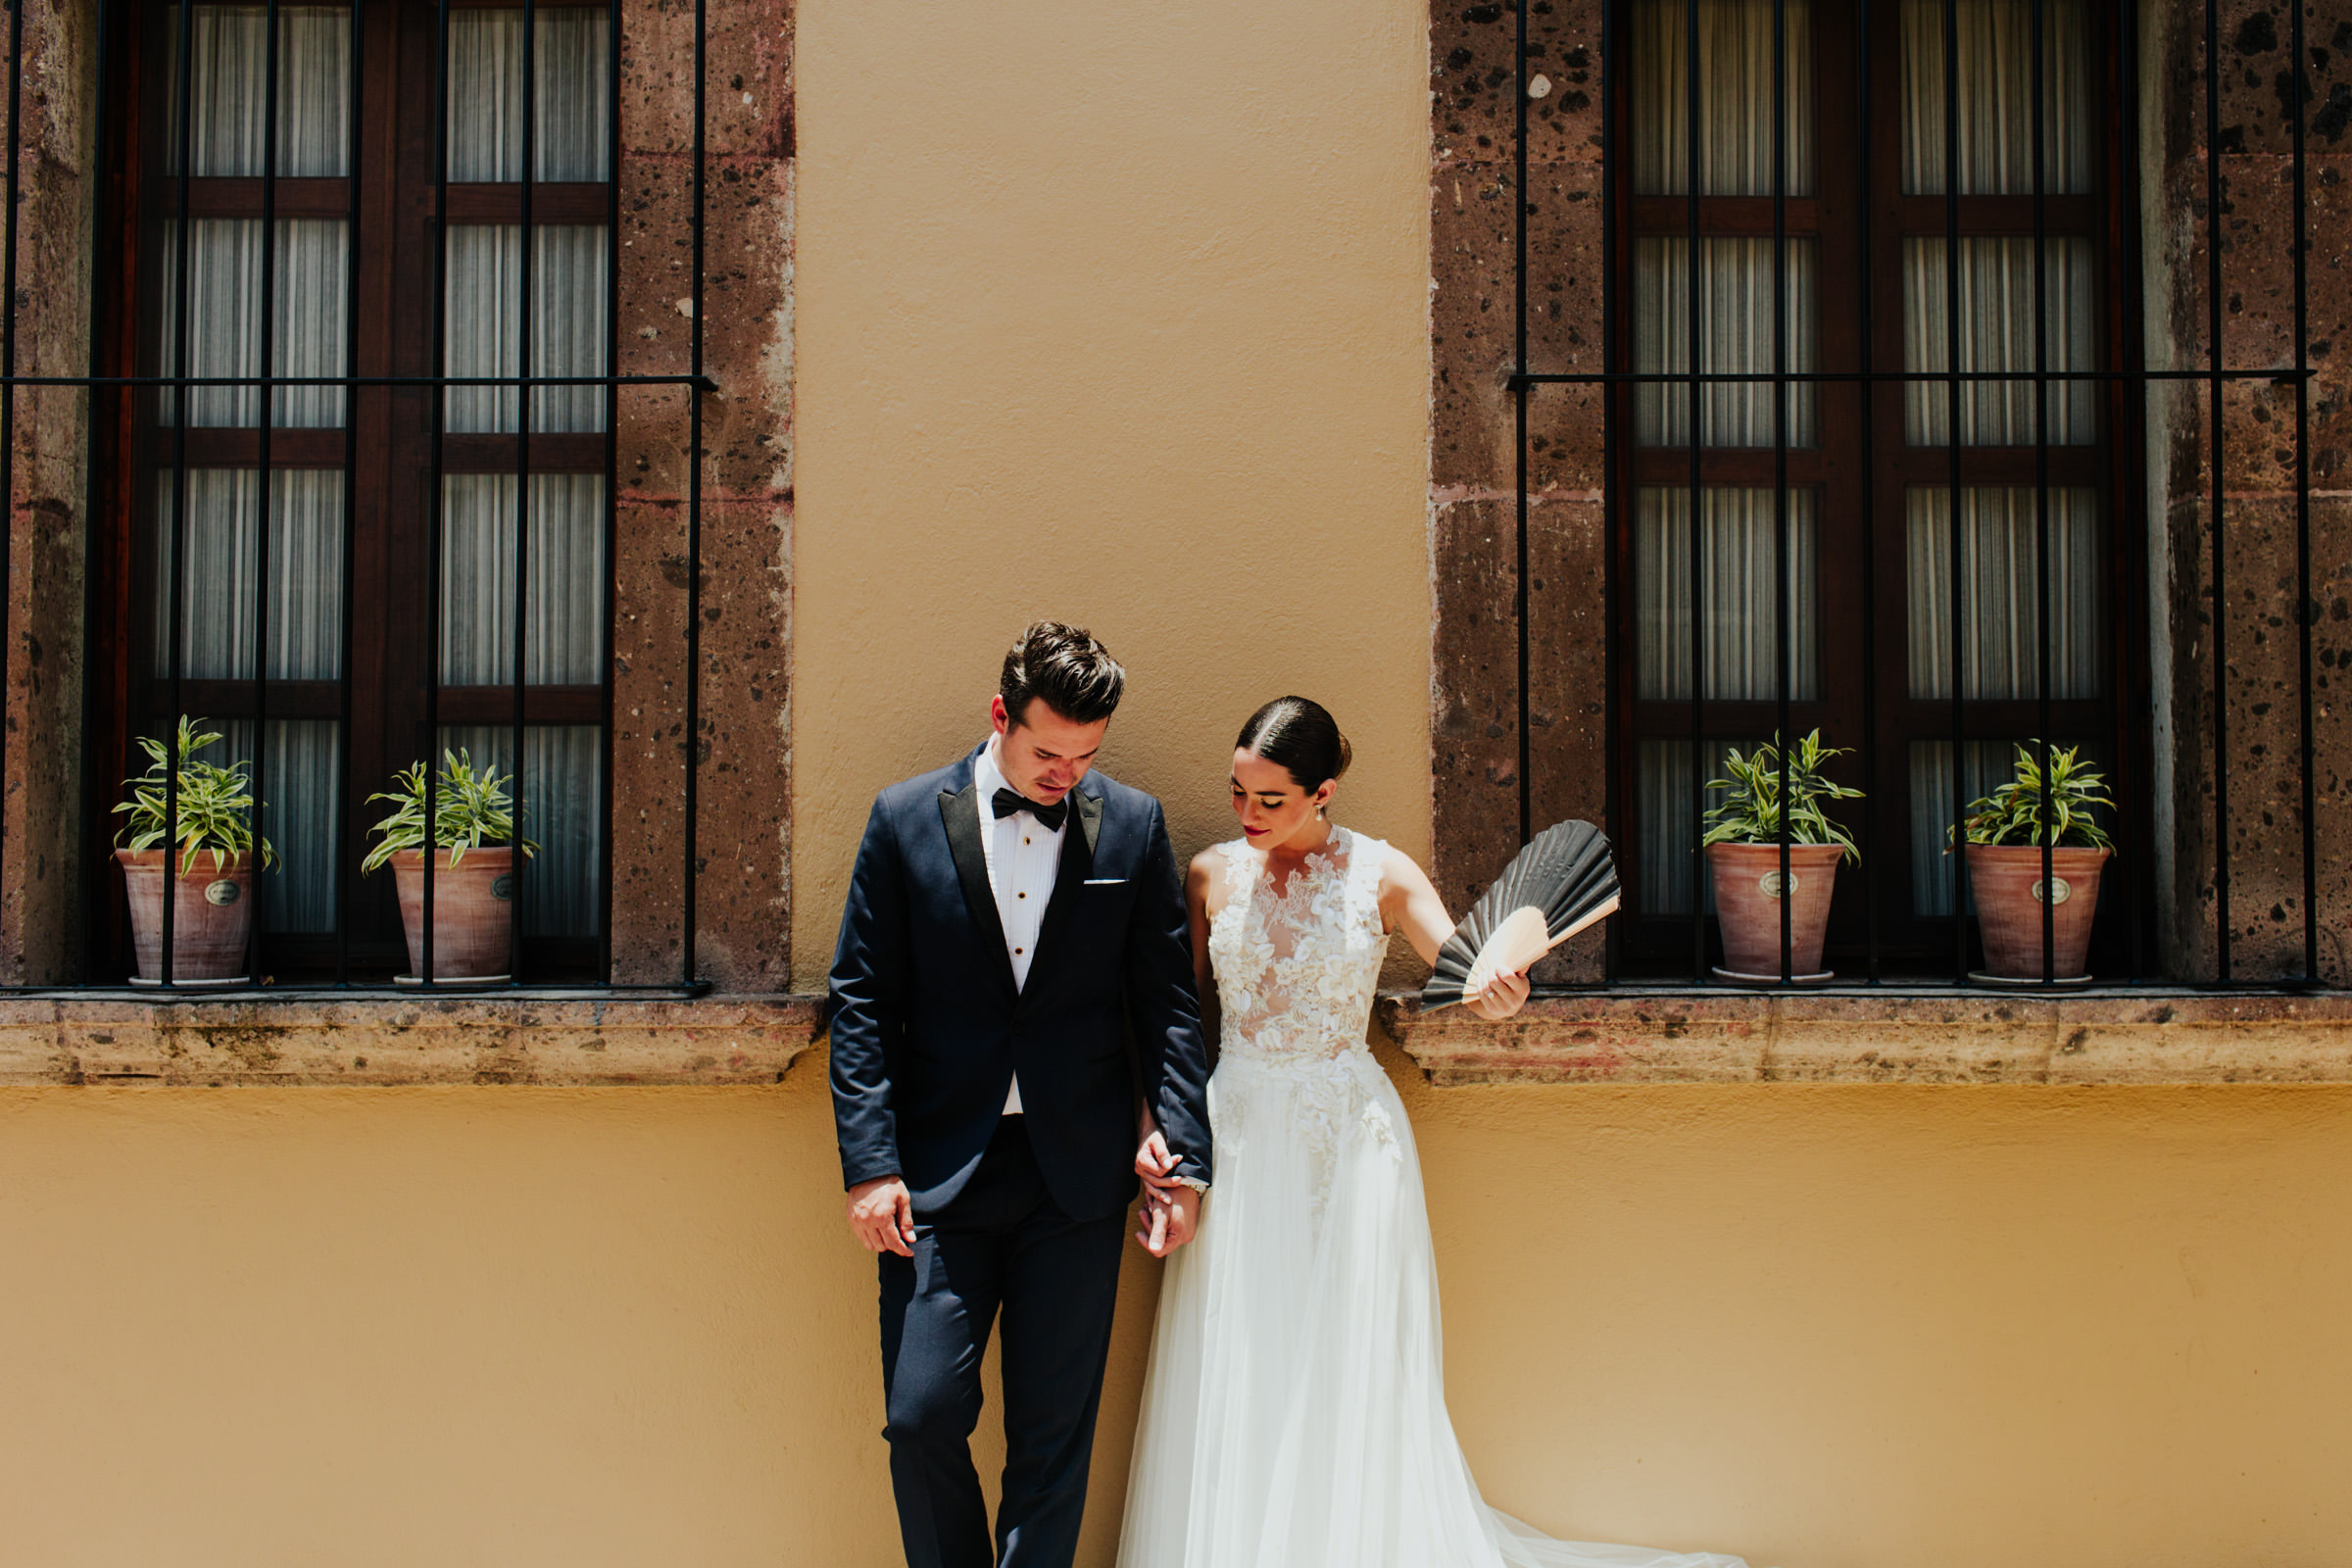 San-Miguel-de-Allende-Wedding-Photography-Parroquia-Instituto-Boda-Fotografia-Fer-Sergio-Pierce-Lifestyle-Photography0221.JPG